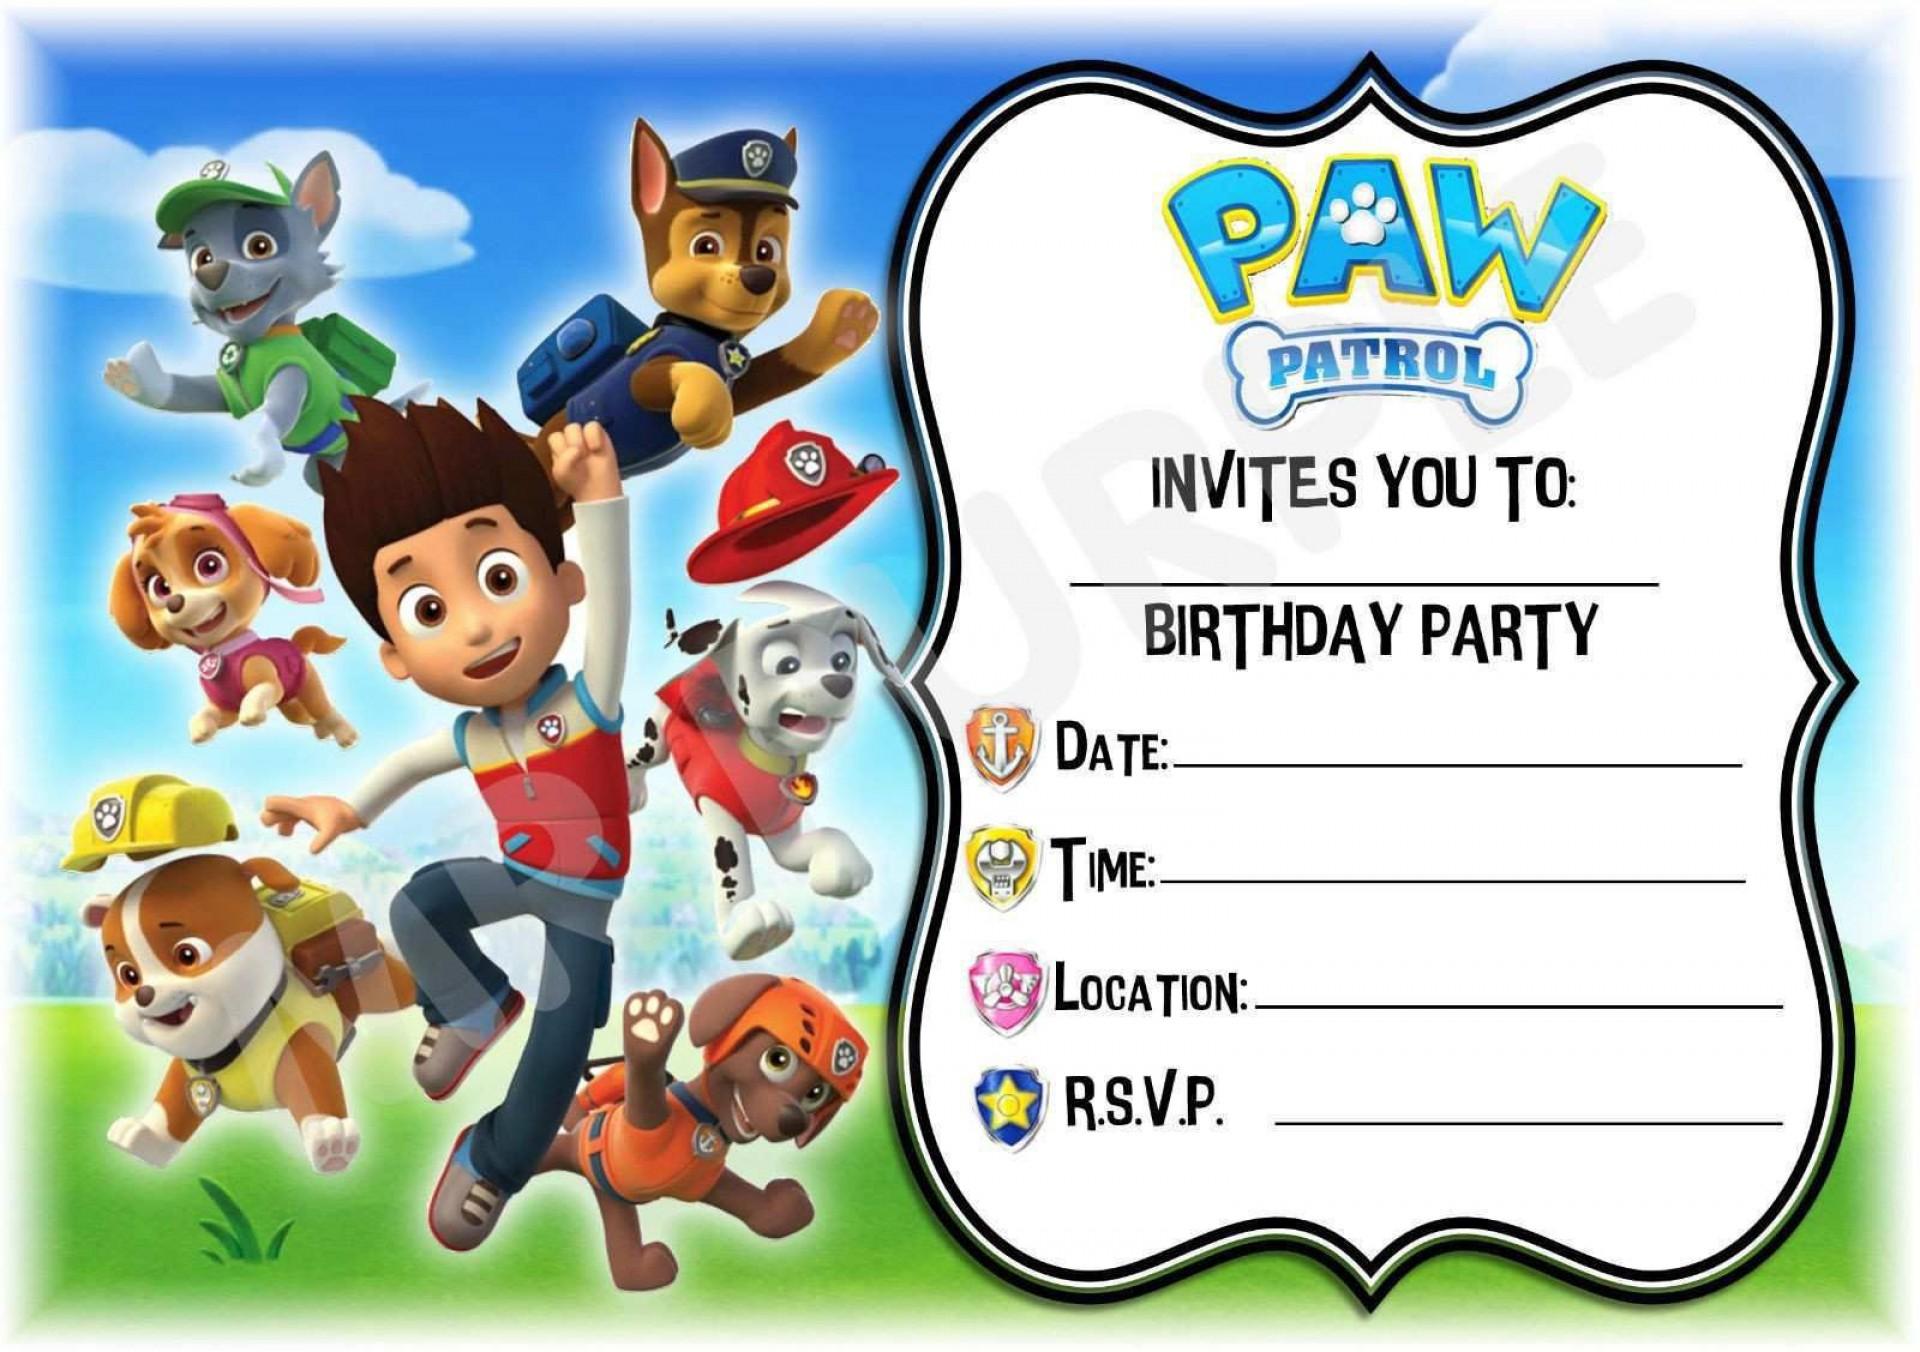 000 Unusual Paw Patrol Birthday Invitation Template Highest Quality  Party Invite Wording Skye Free1920